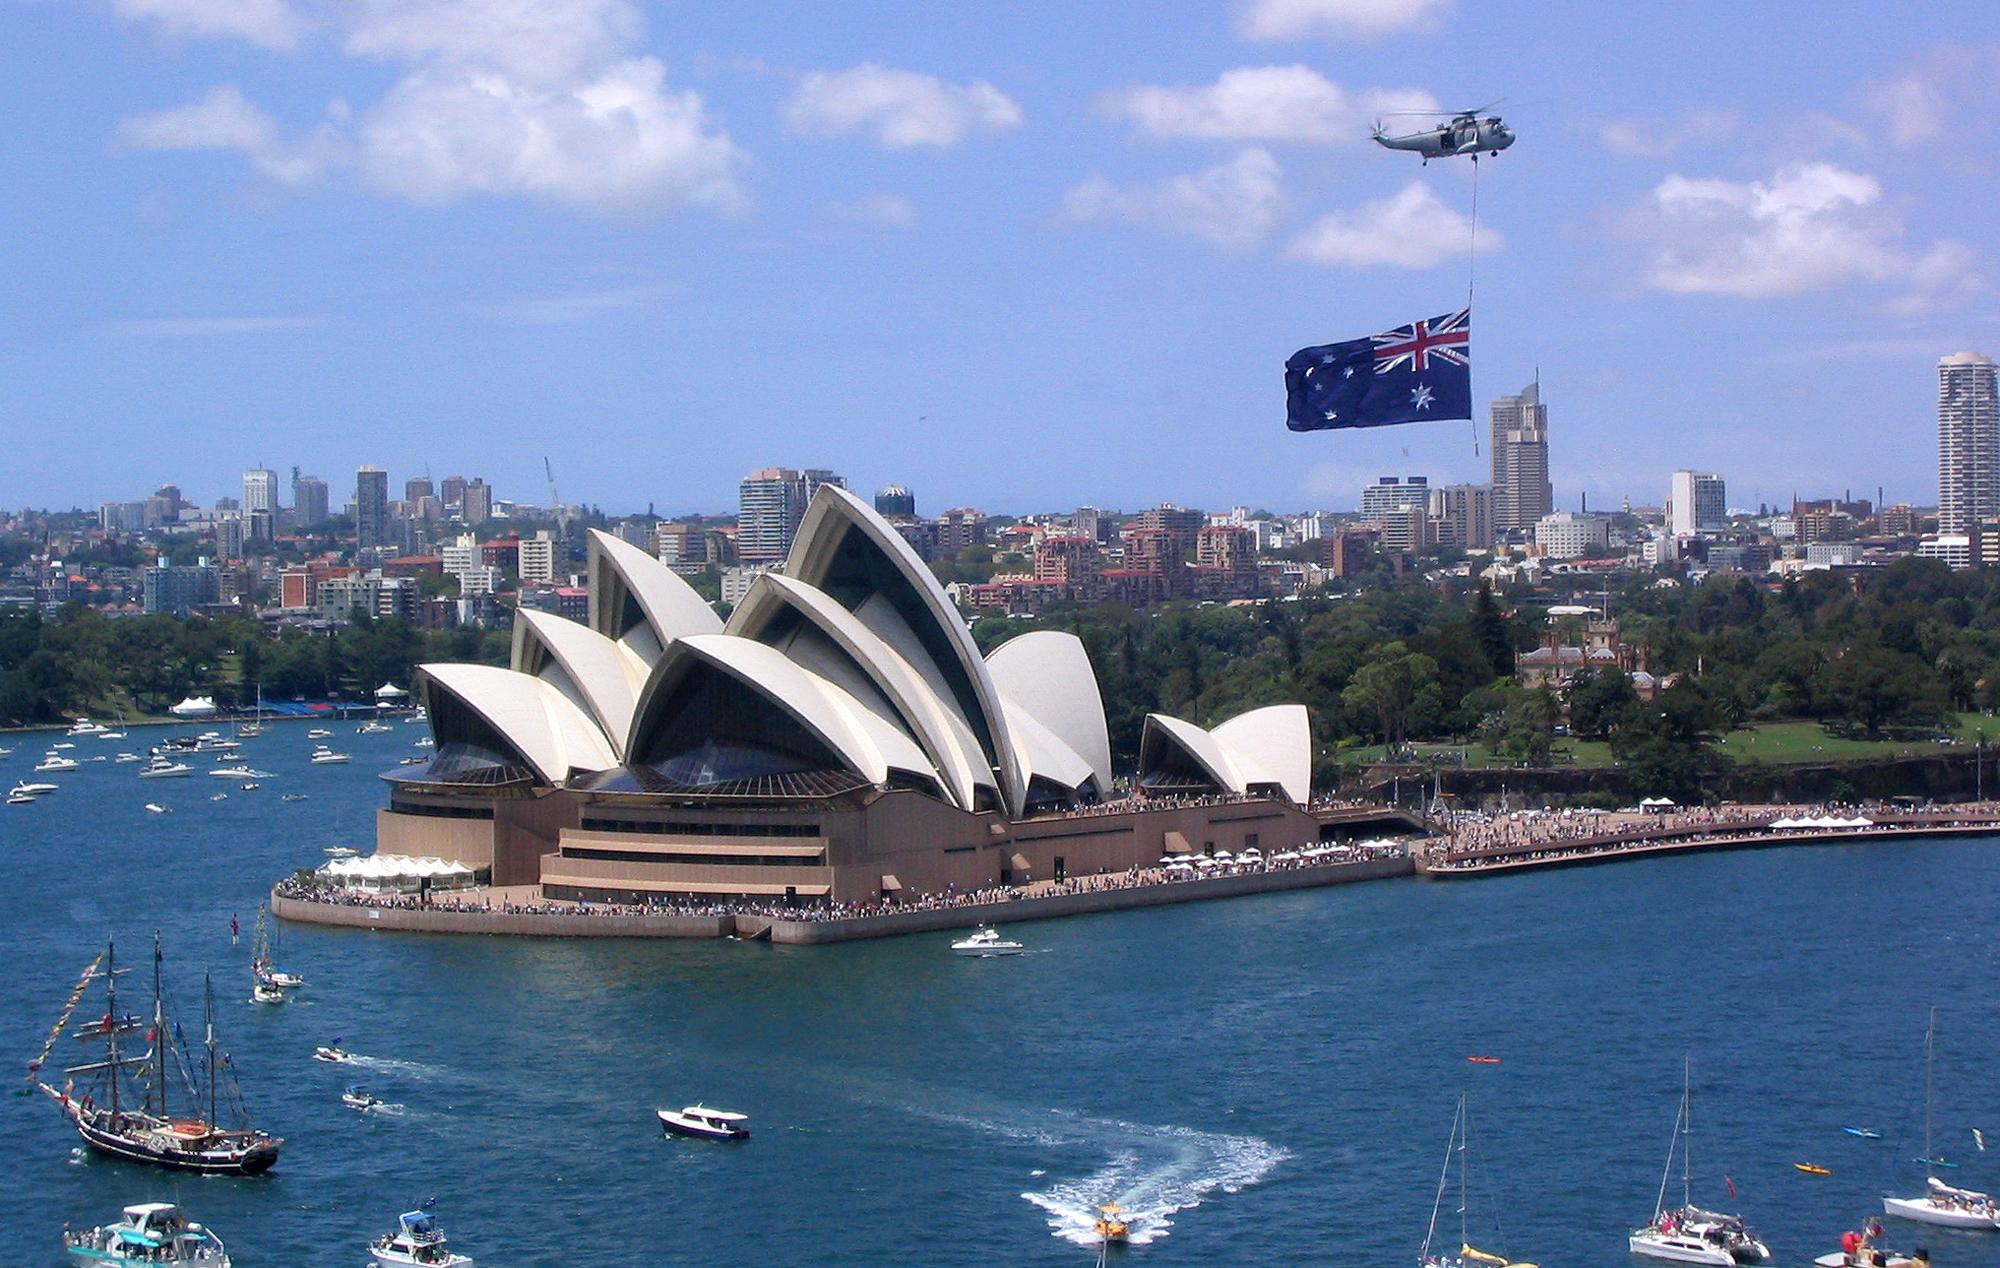 Australia won't be 'intimidated' by China economic threats